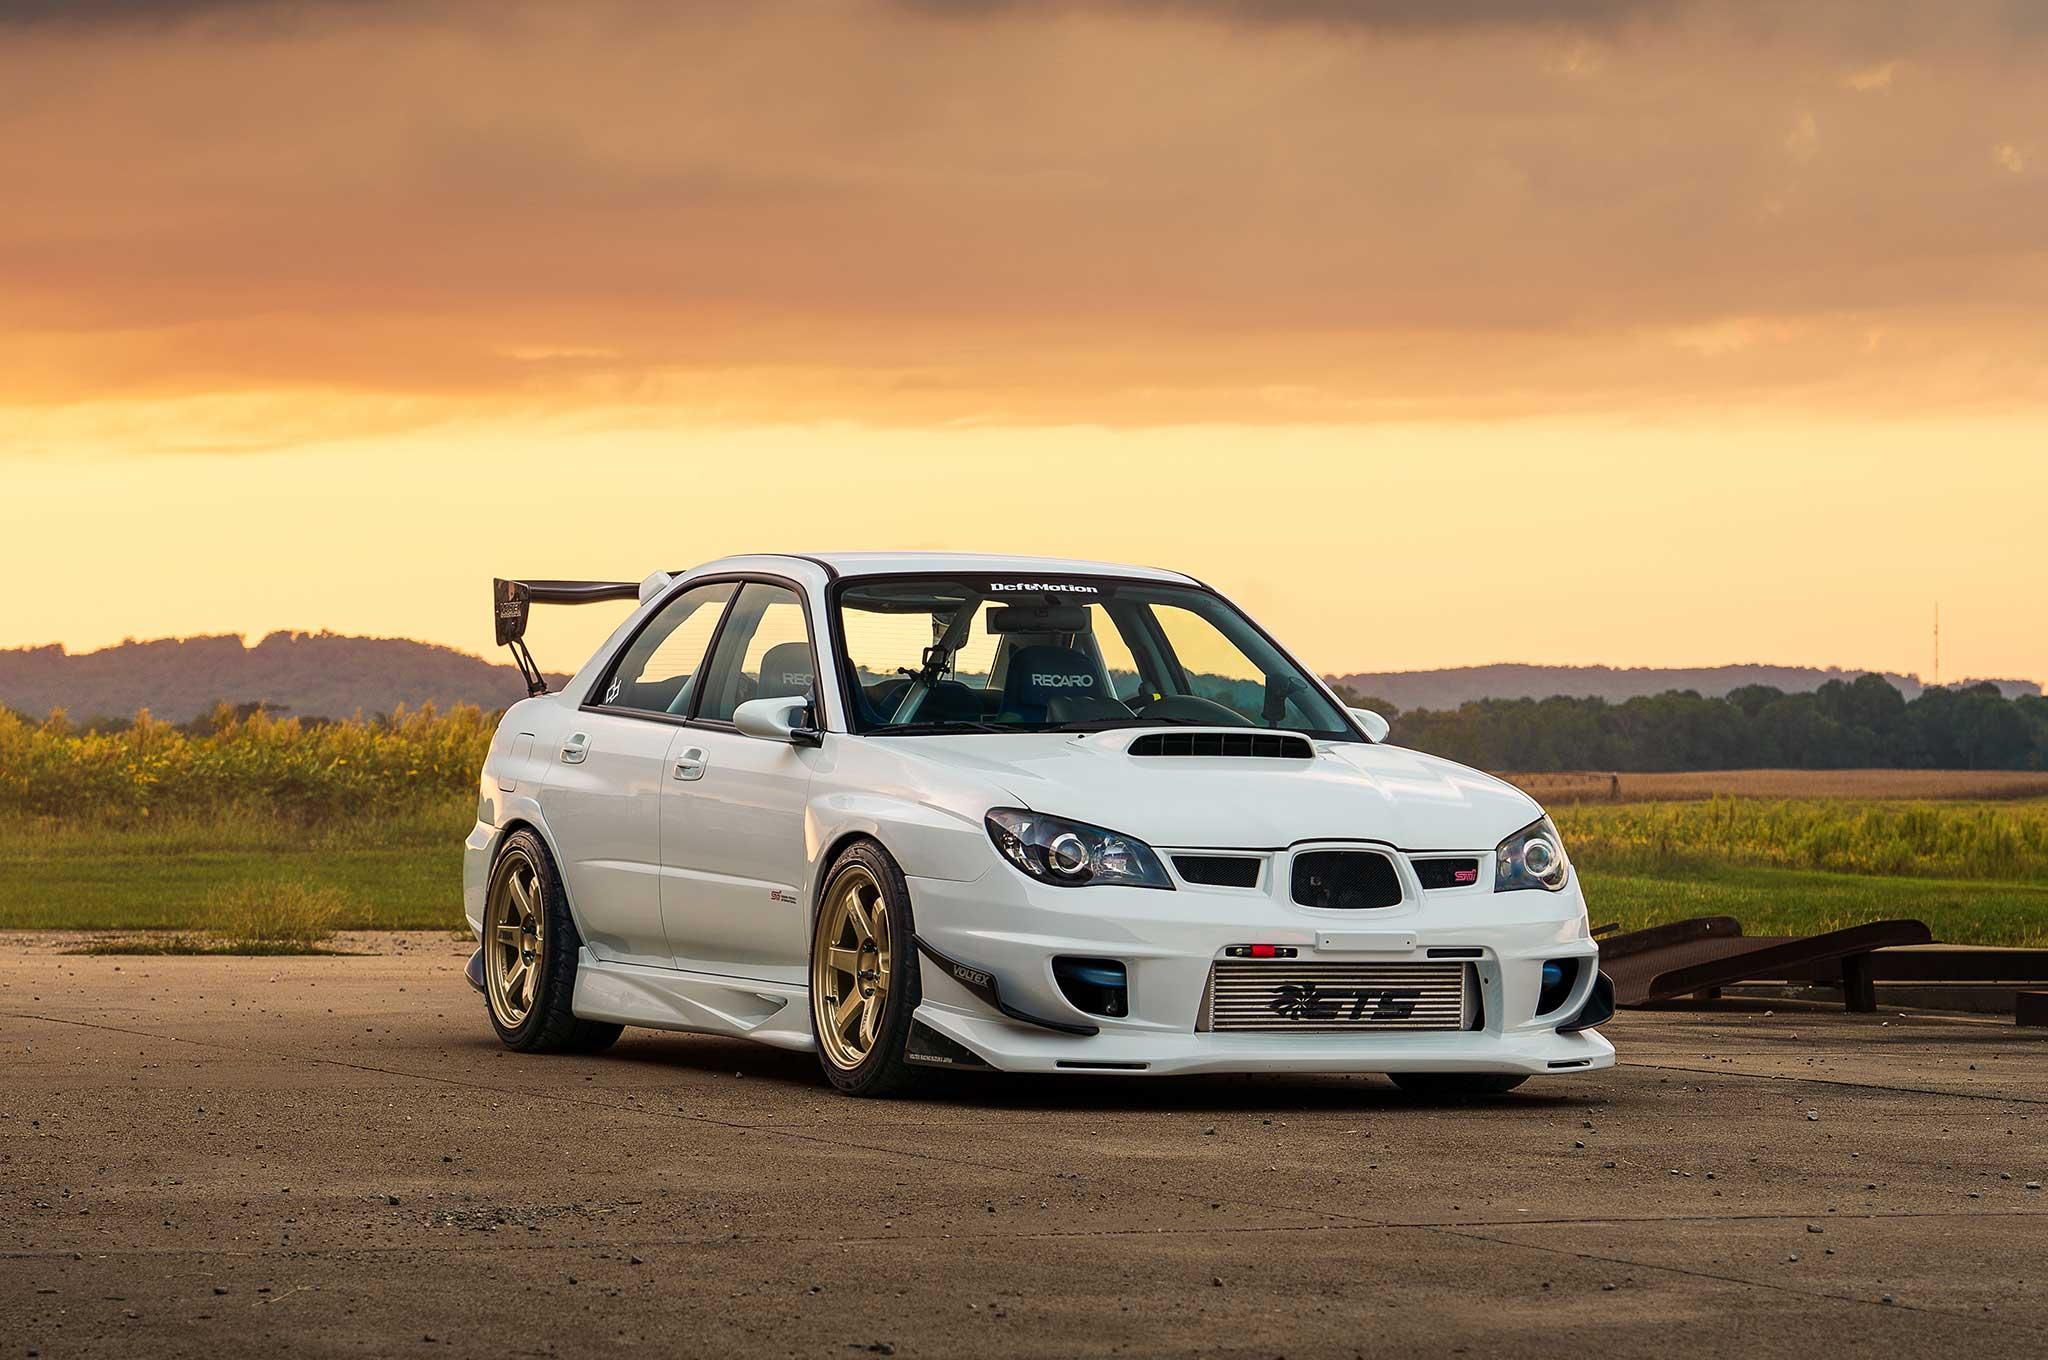 Voltex Subaru Wrx Sti Turbo